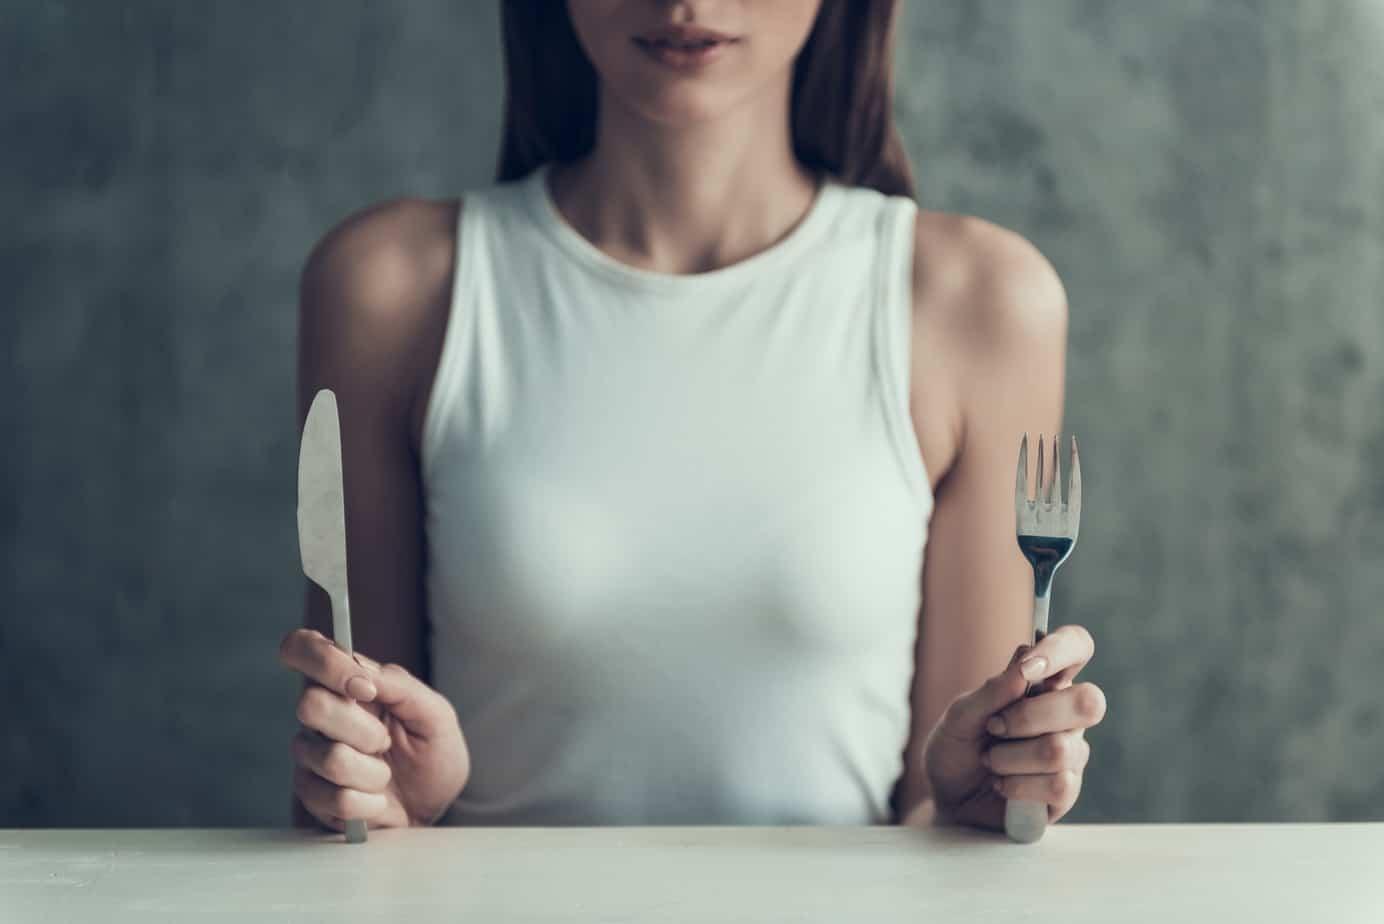 Dieta digiuno fame